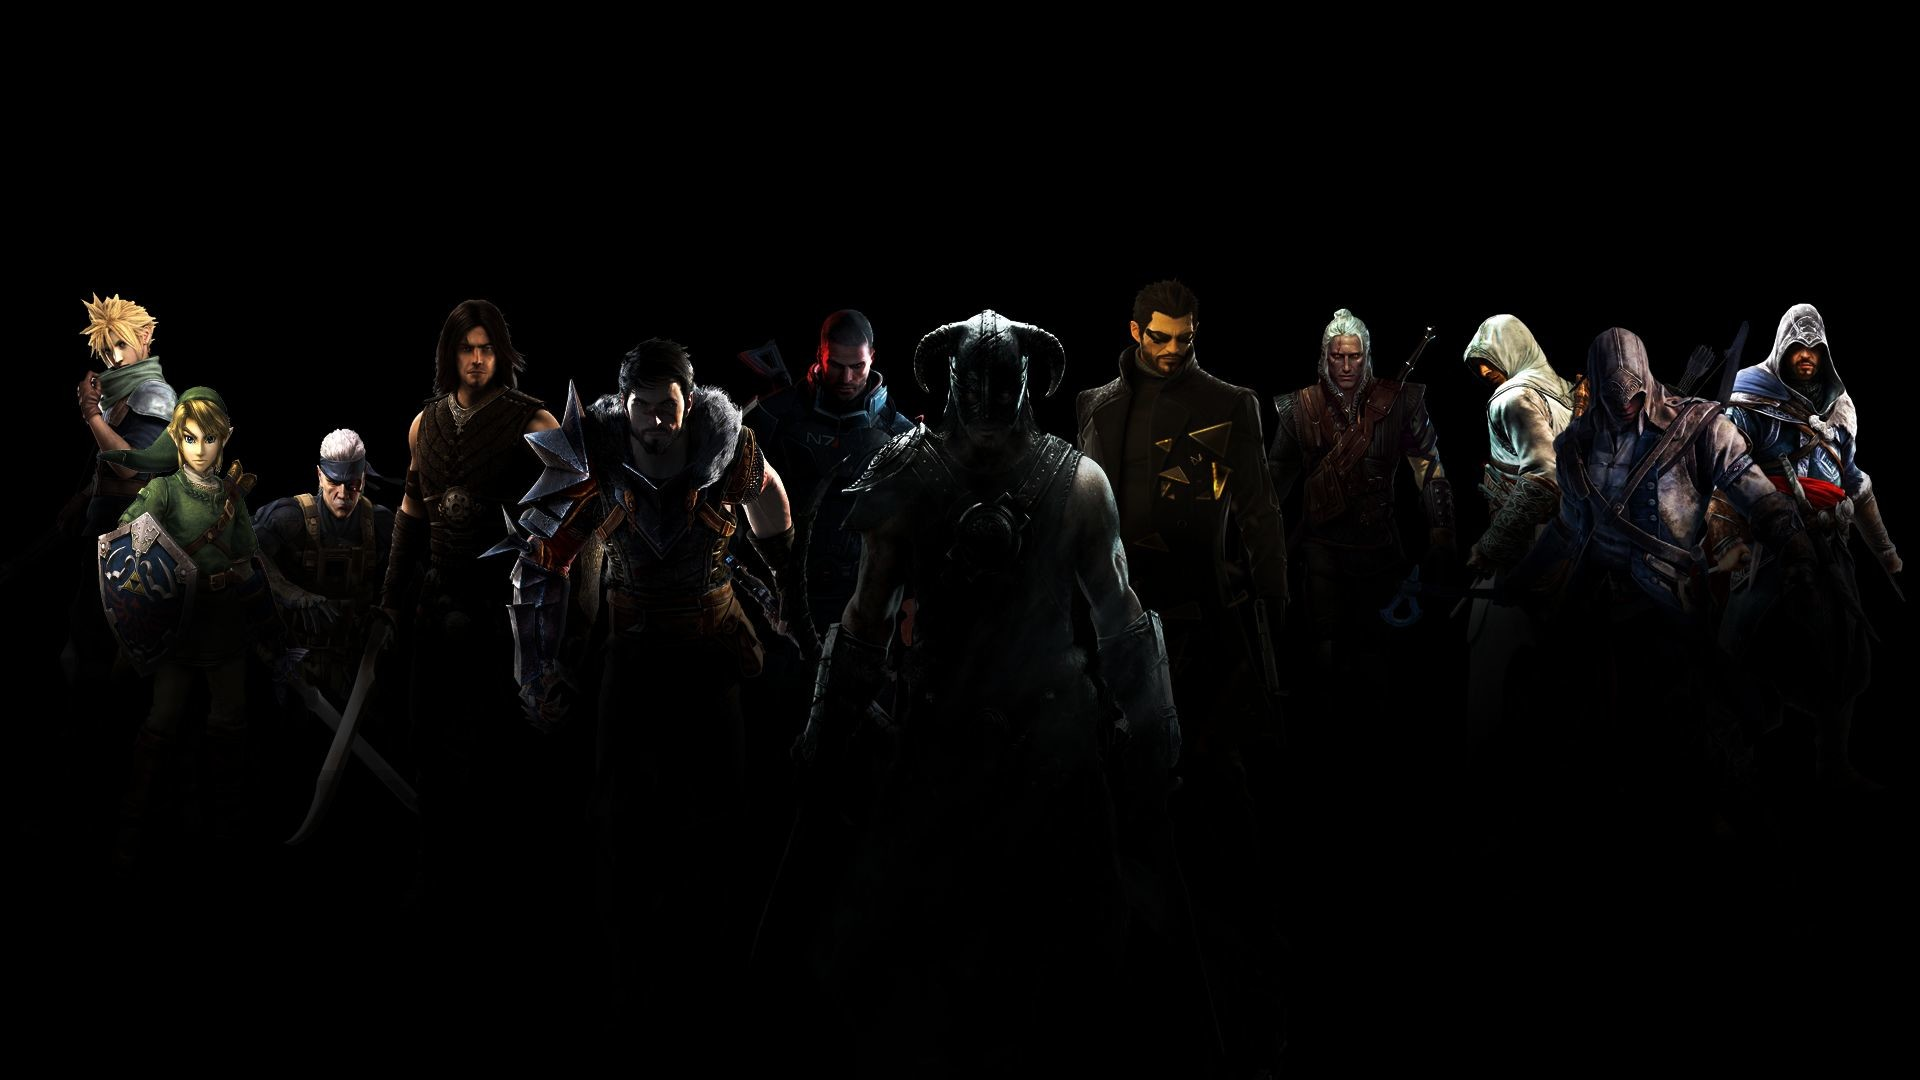 Videogame Wallpaper 1